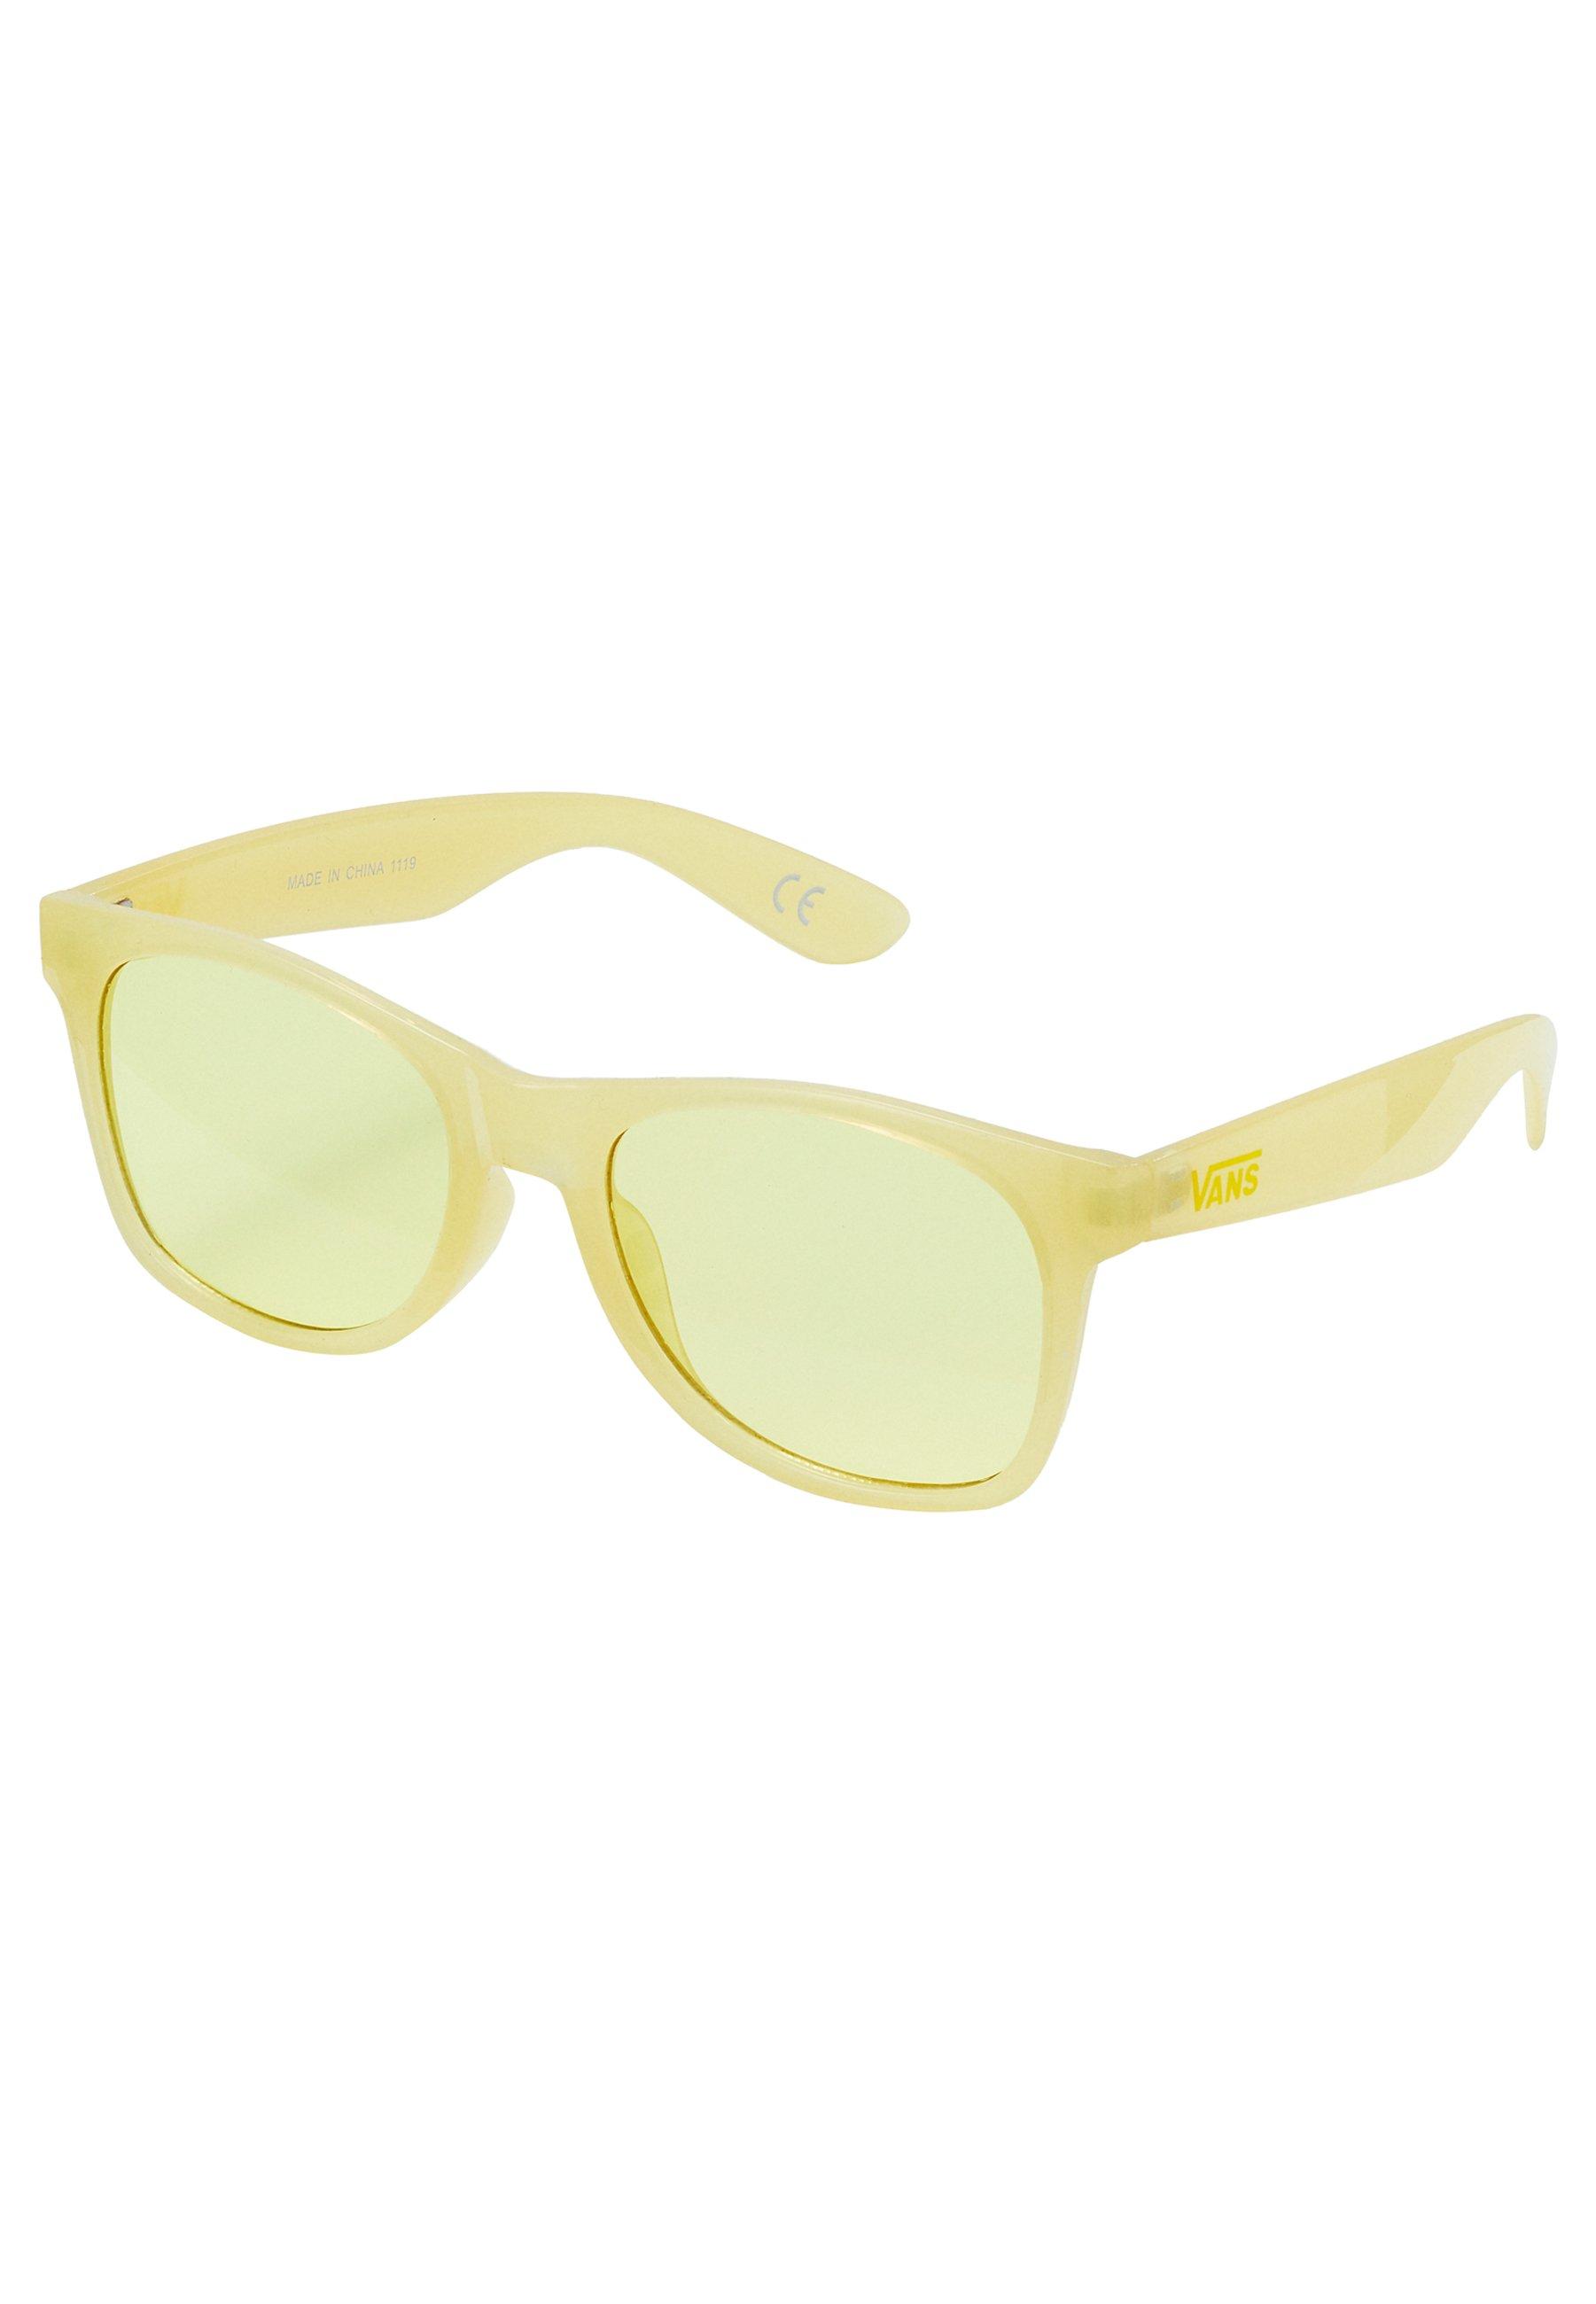 Vans Spicoli Flat Shades Sunglasses Yellow Cream Zalando Ie